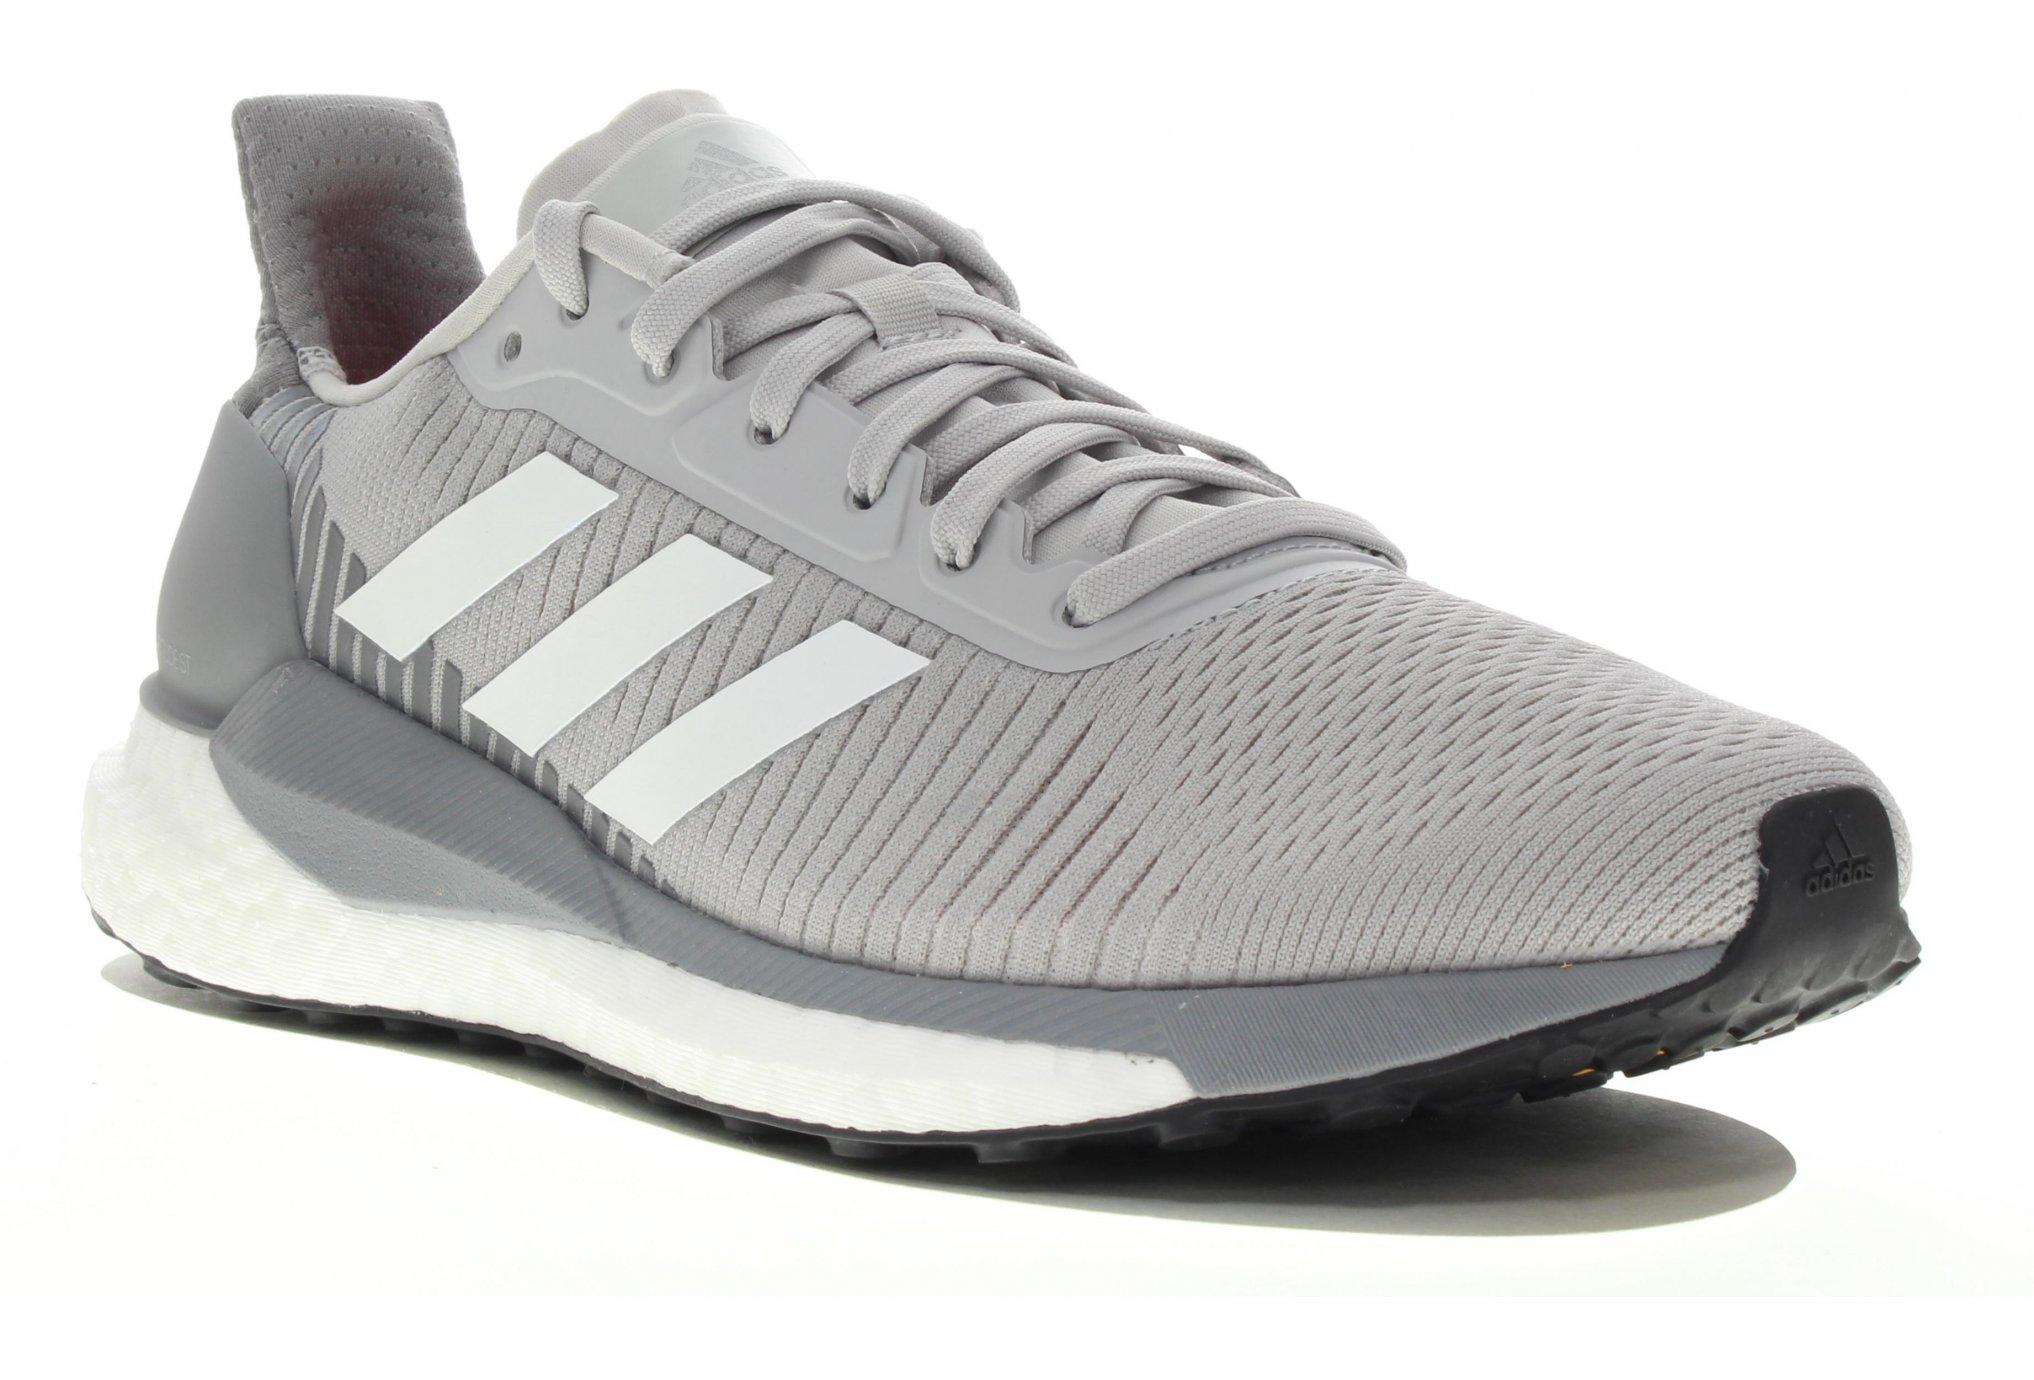 adidas Solar Glide ST 19 W Chaussures running femme